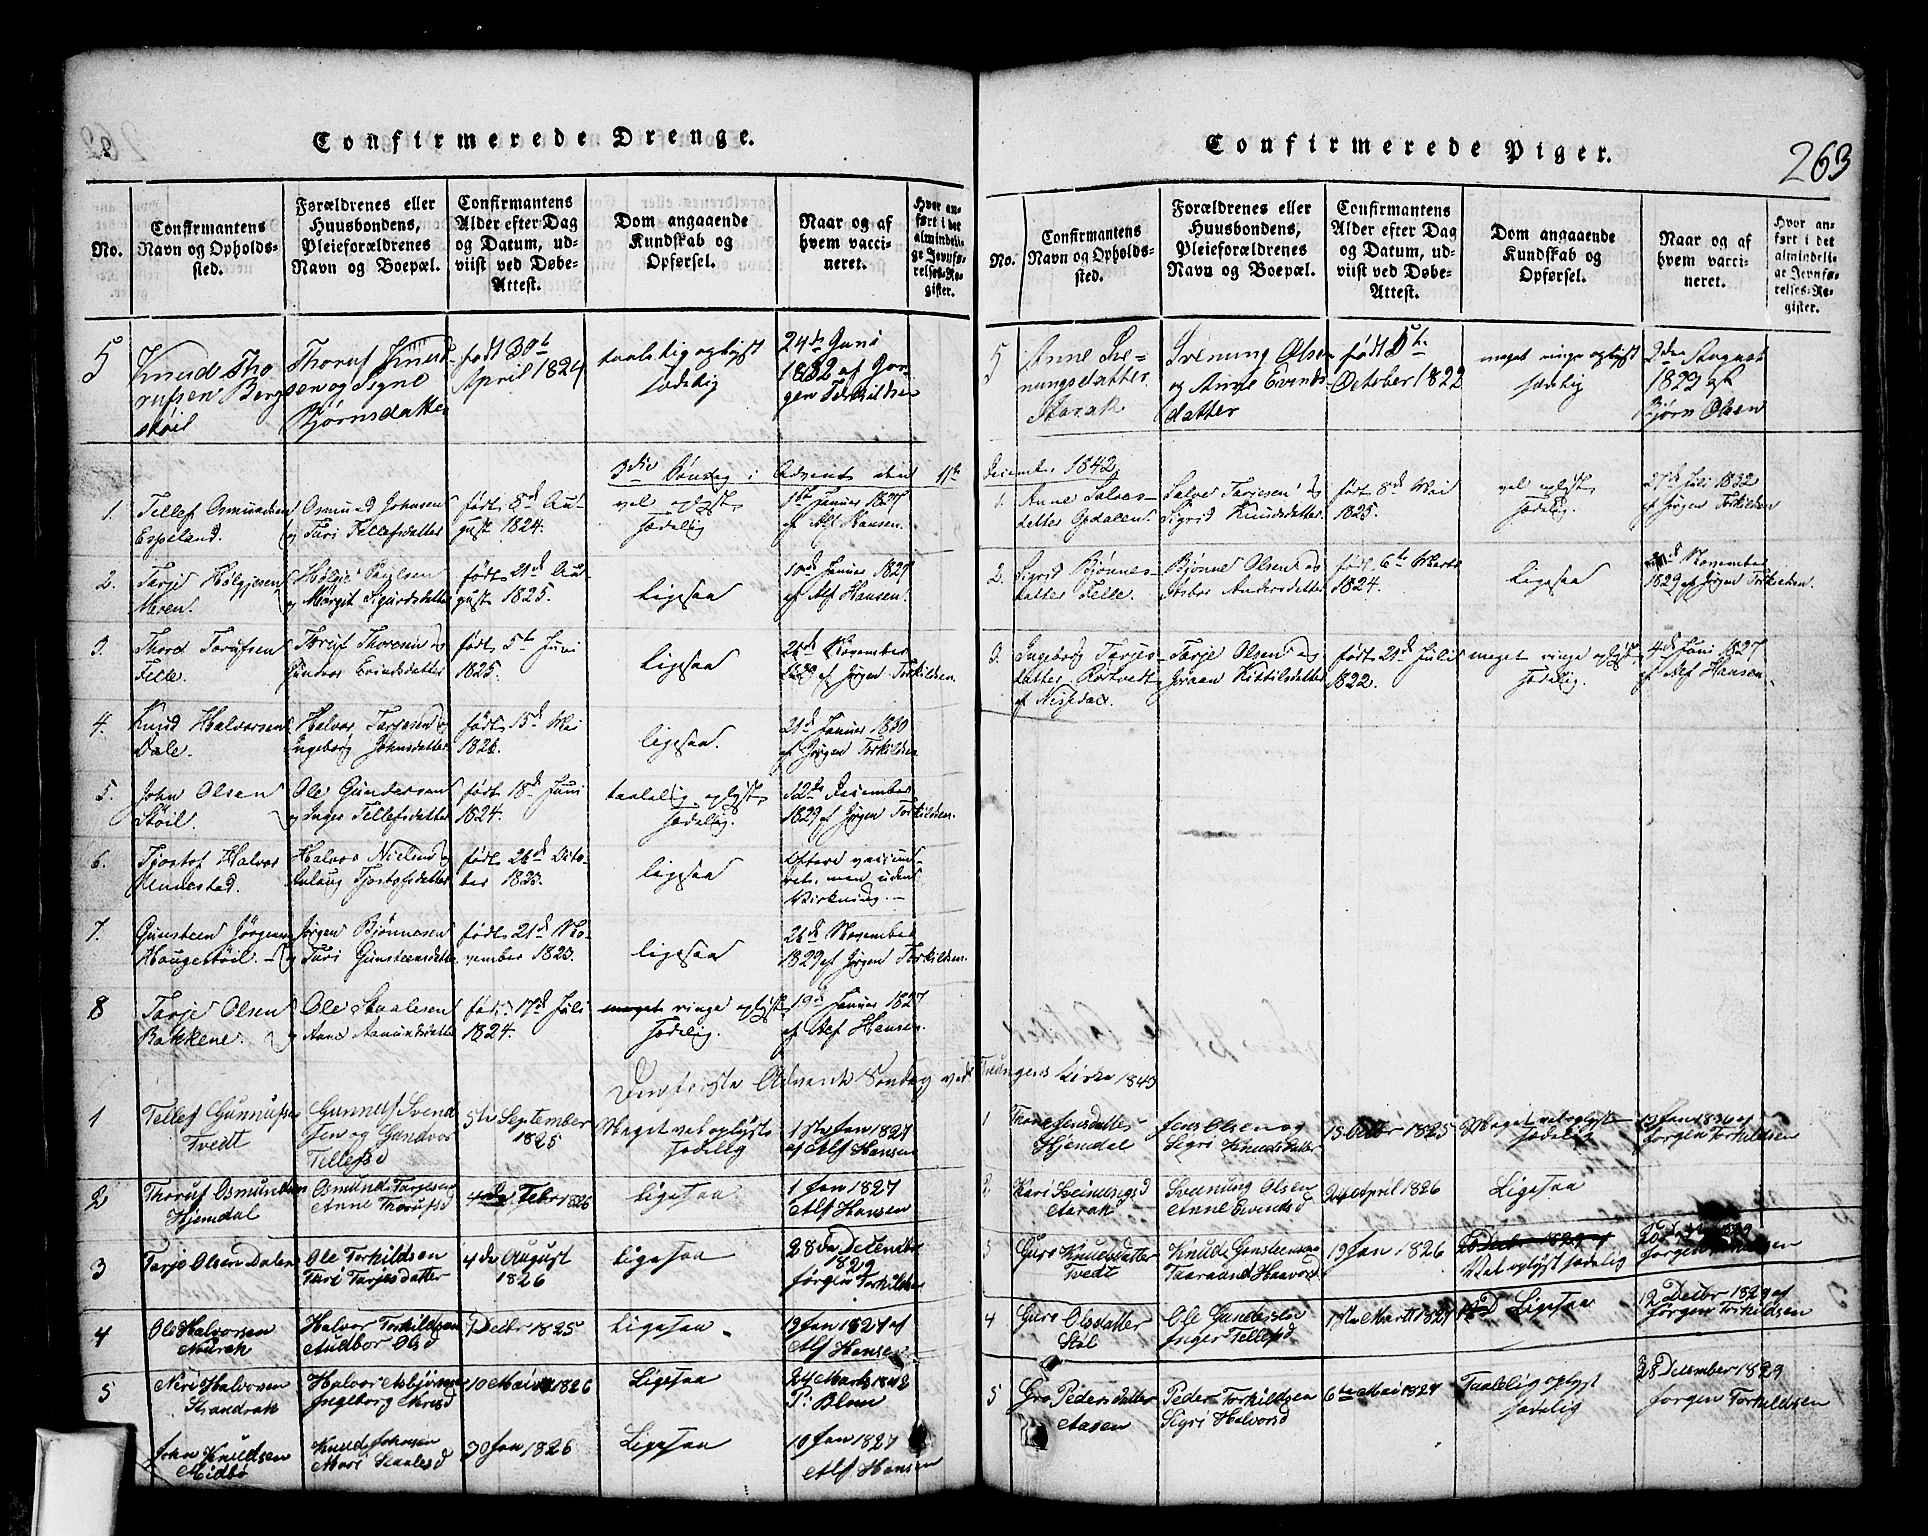 SAKO, Nissedal kirkebøker, G/Gb/L0001: Klokkerbok nr. II 1, 1814-1862, s. 263